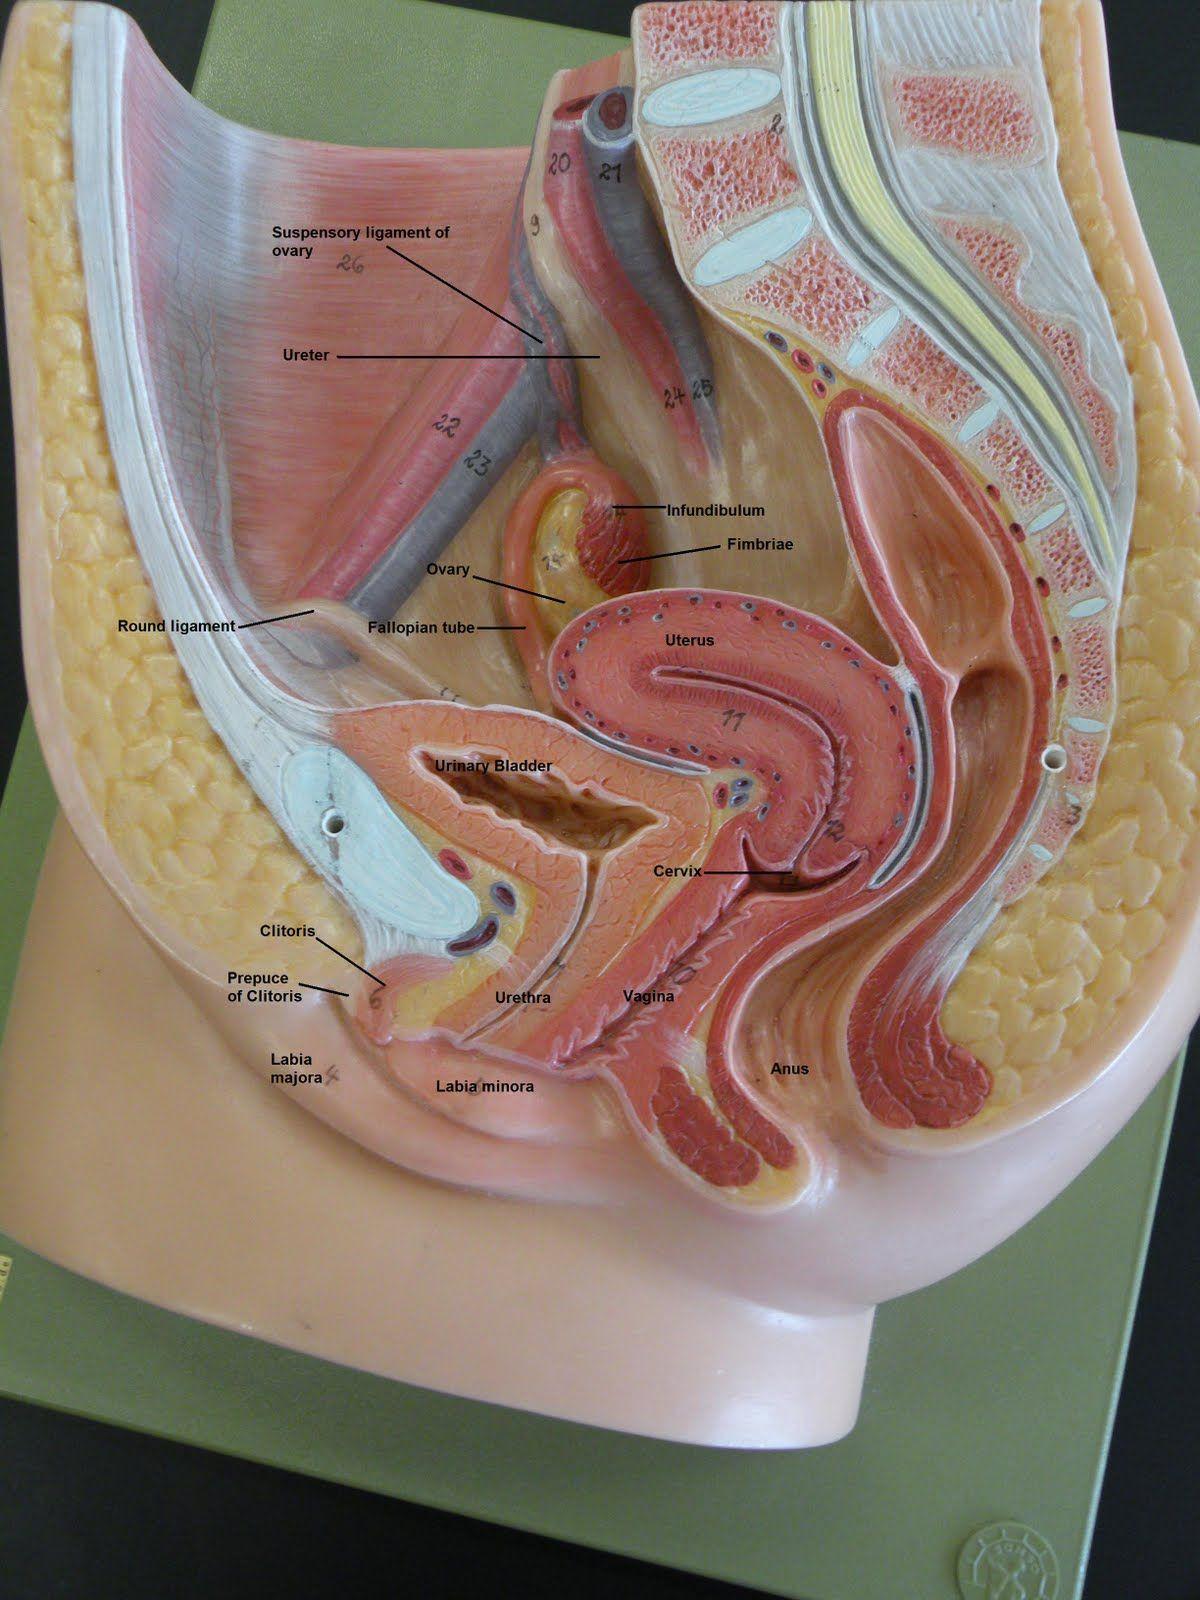 Pin By Adriana Mendez On Anatomy  Female Reproductive System Anatomy, Anatomy And -9802